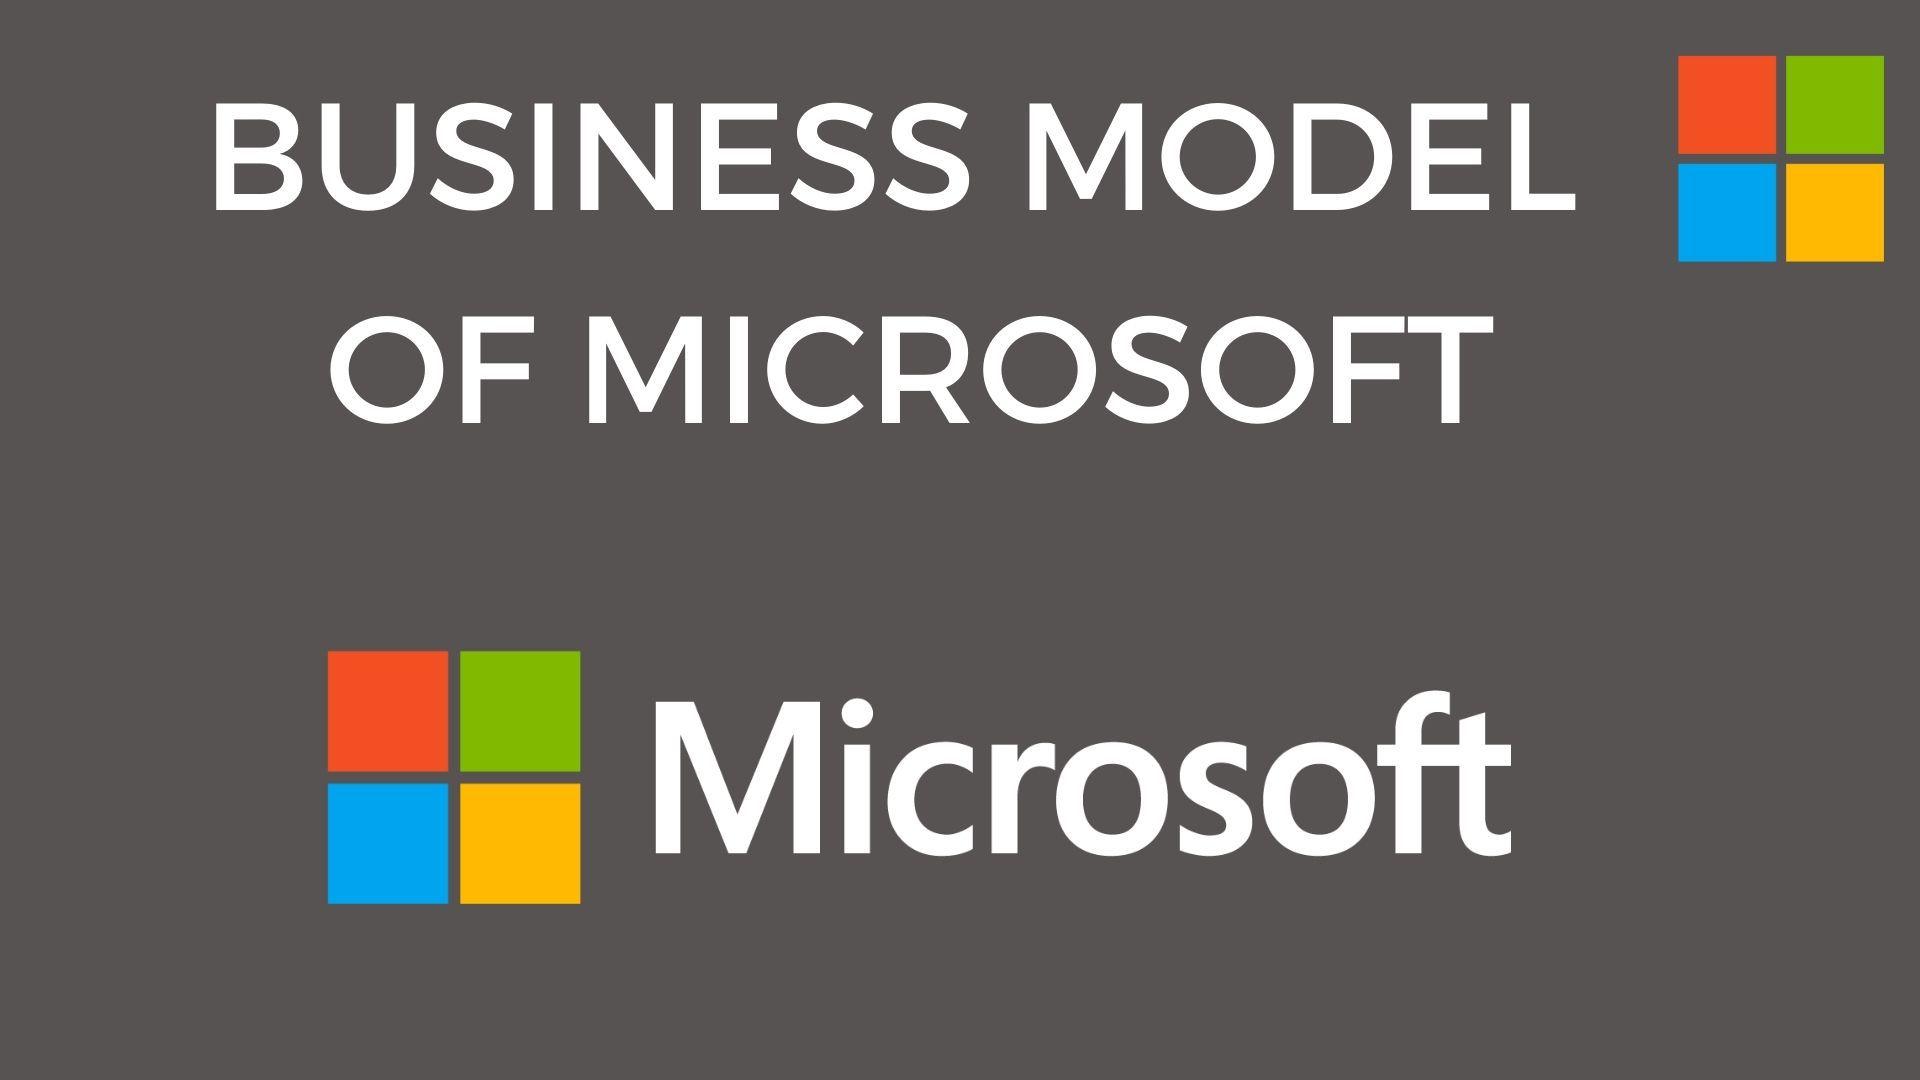 Business Model of Microsoft